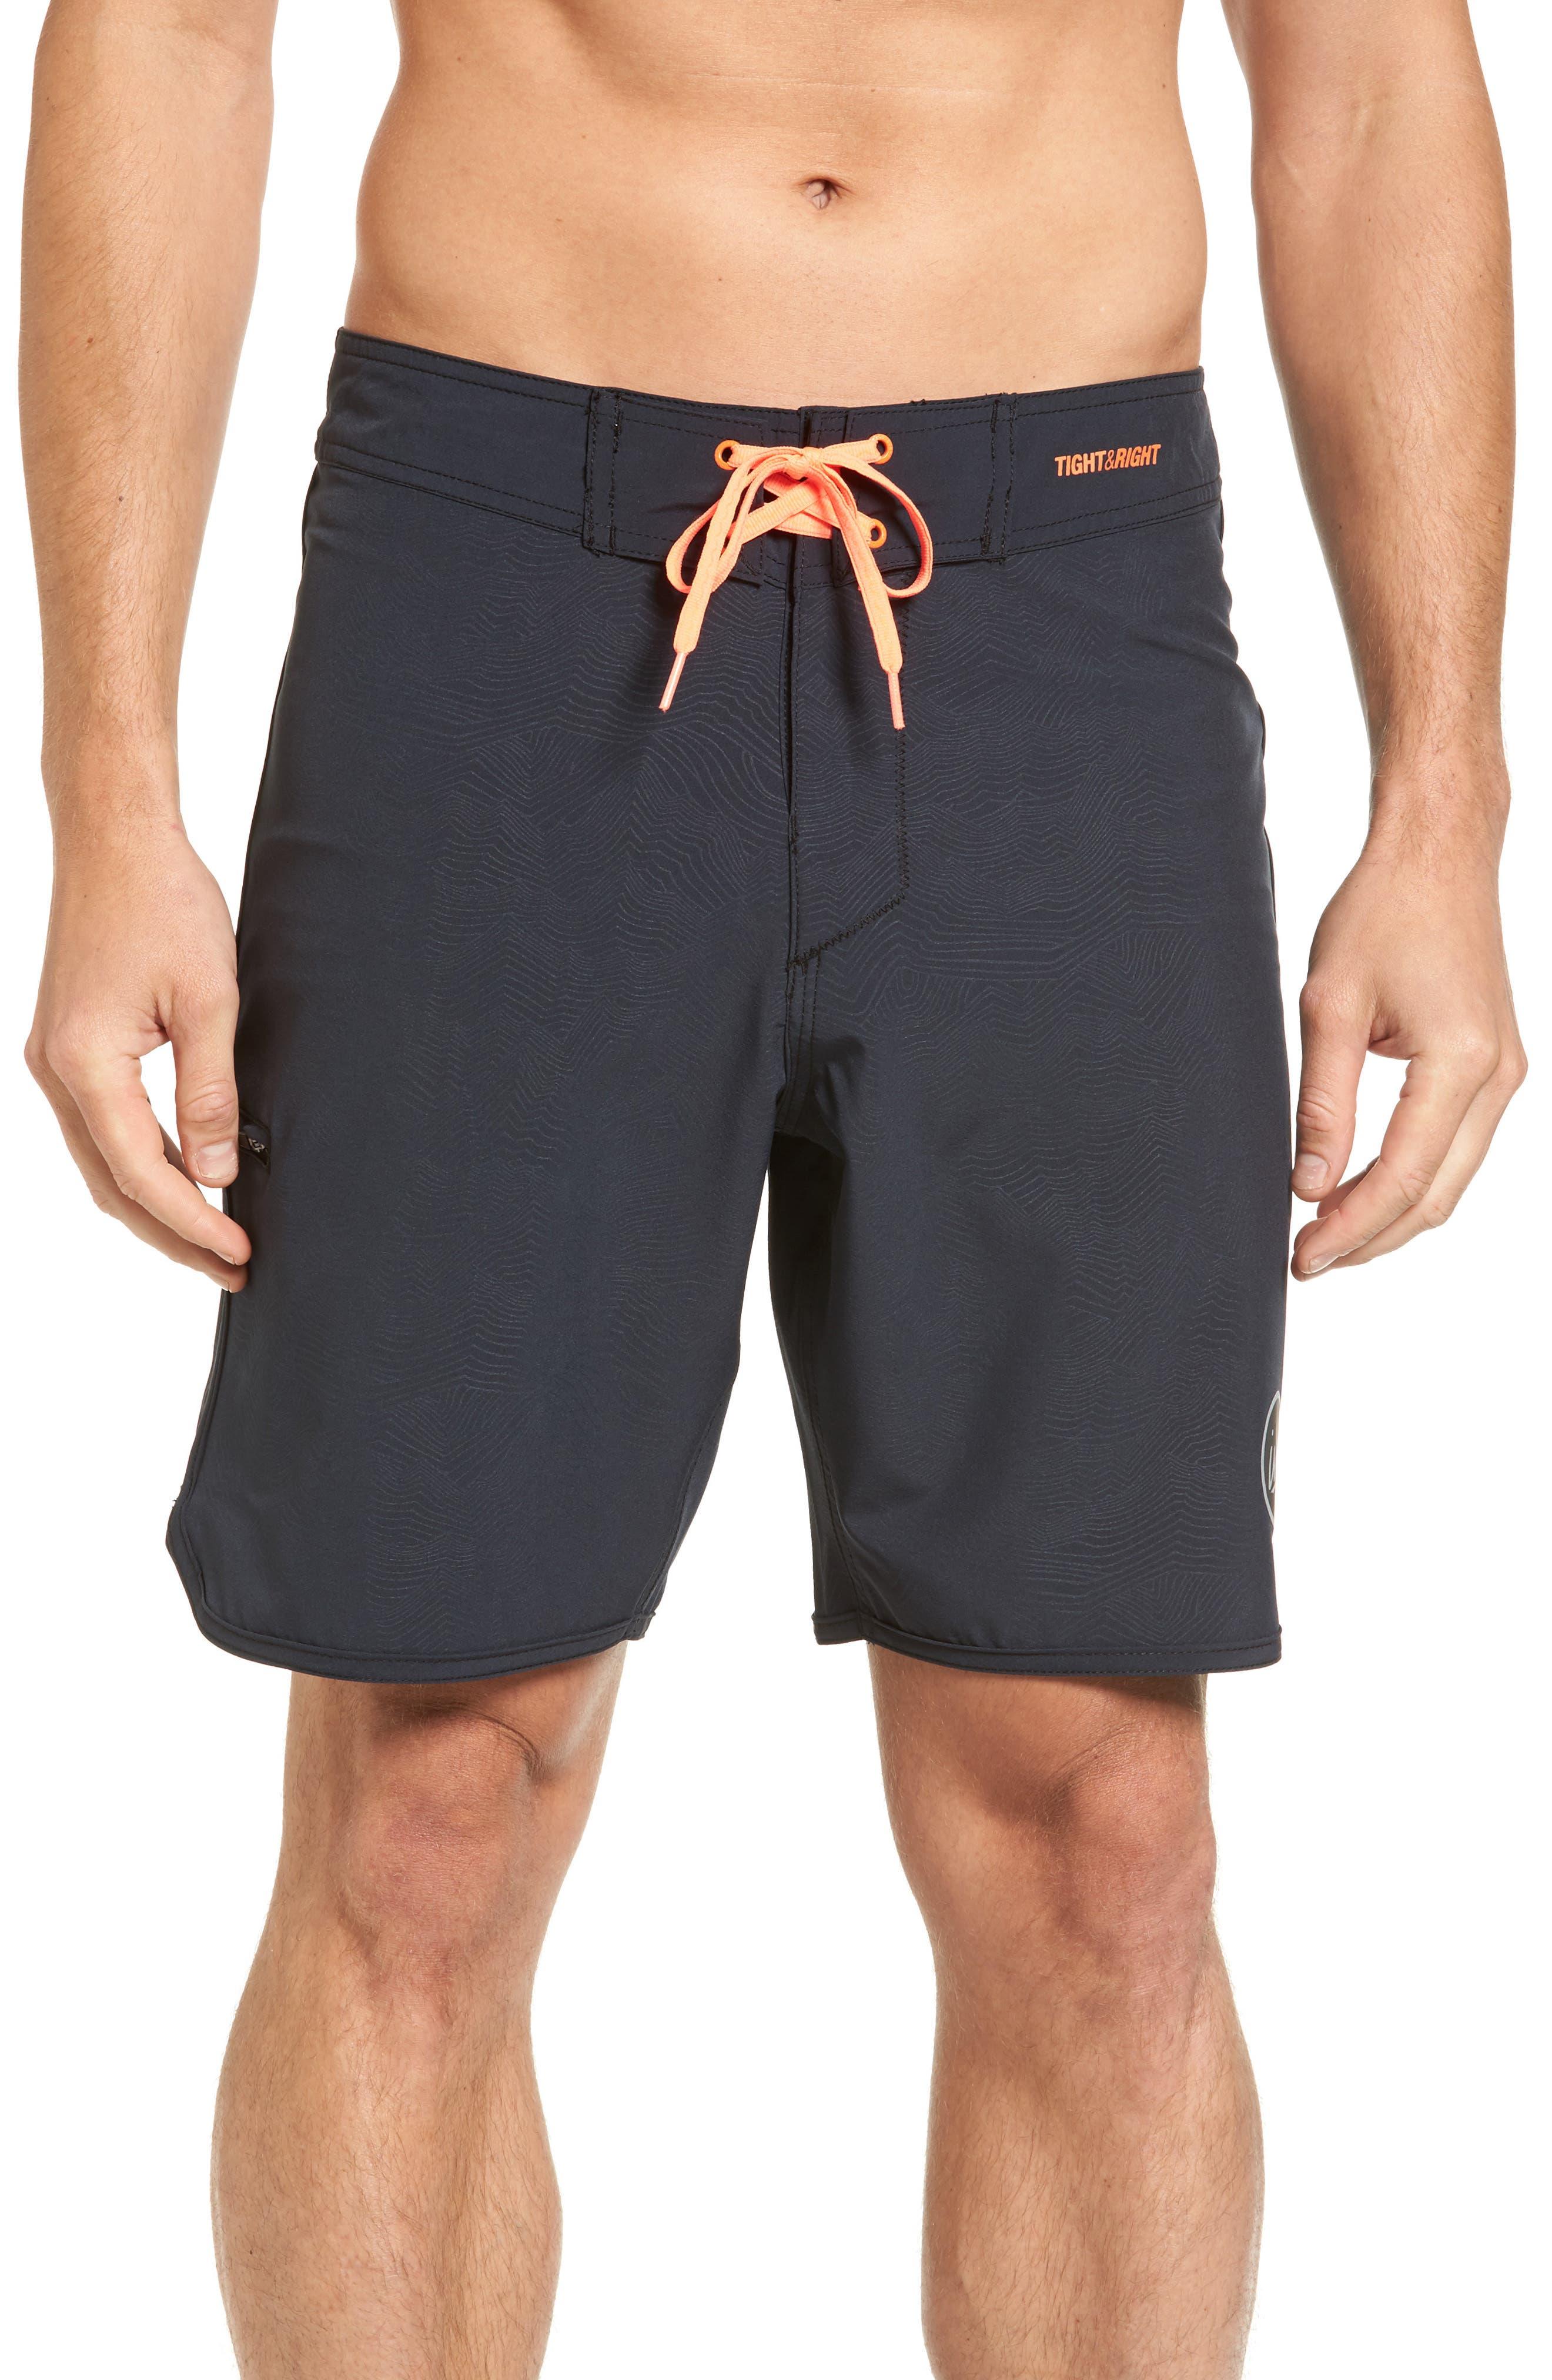 Elevation Board Shorts,                         Main,                         color, 001